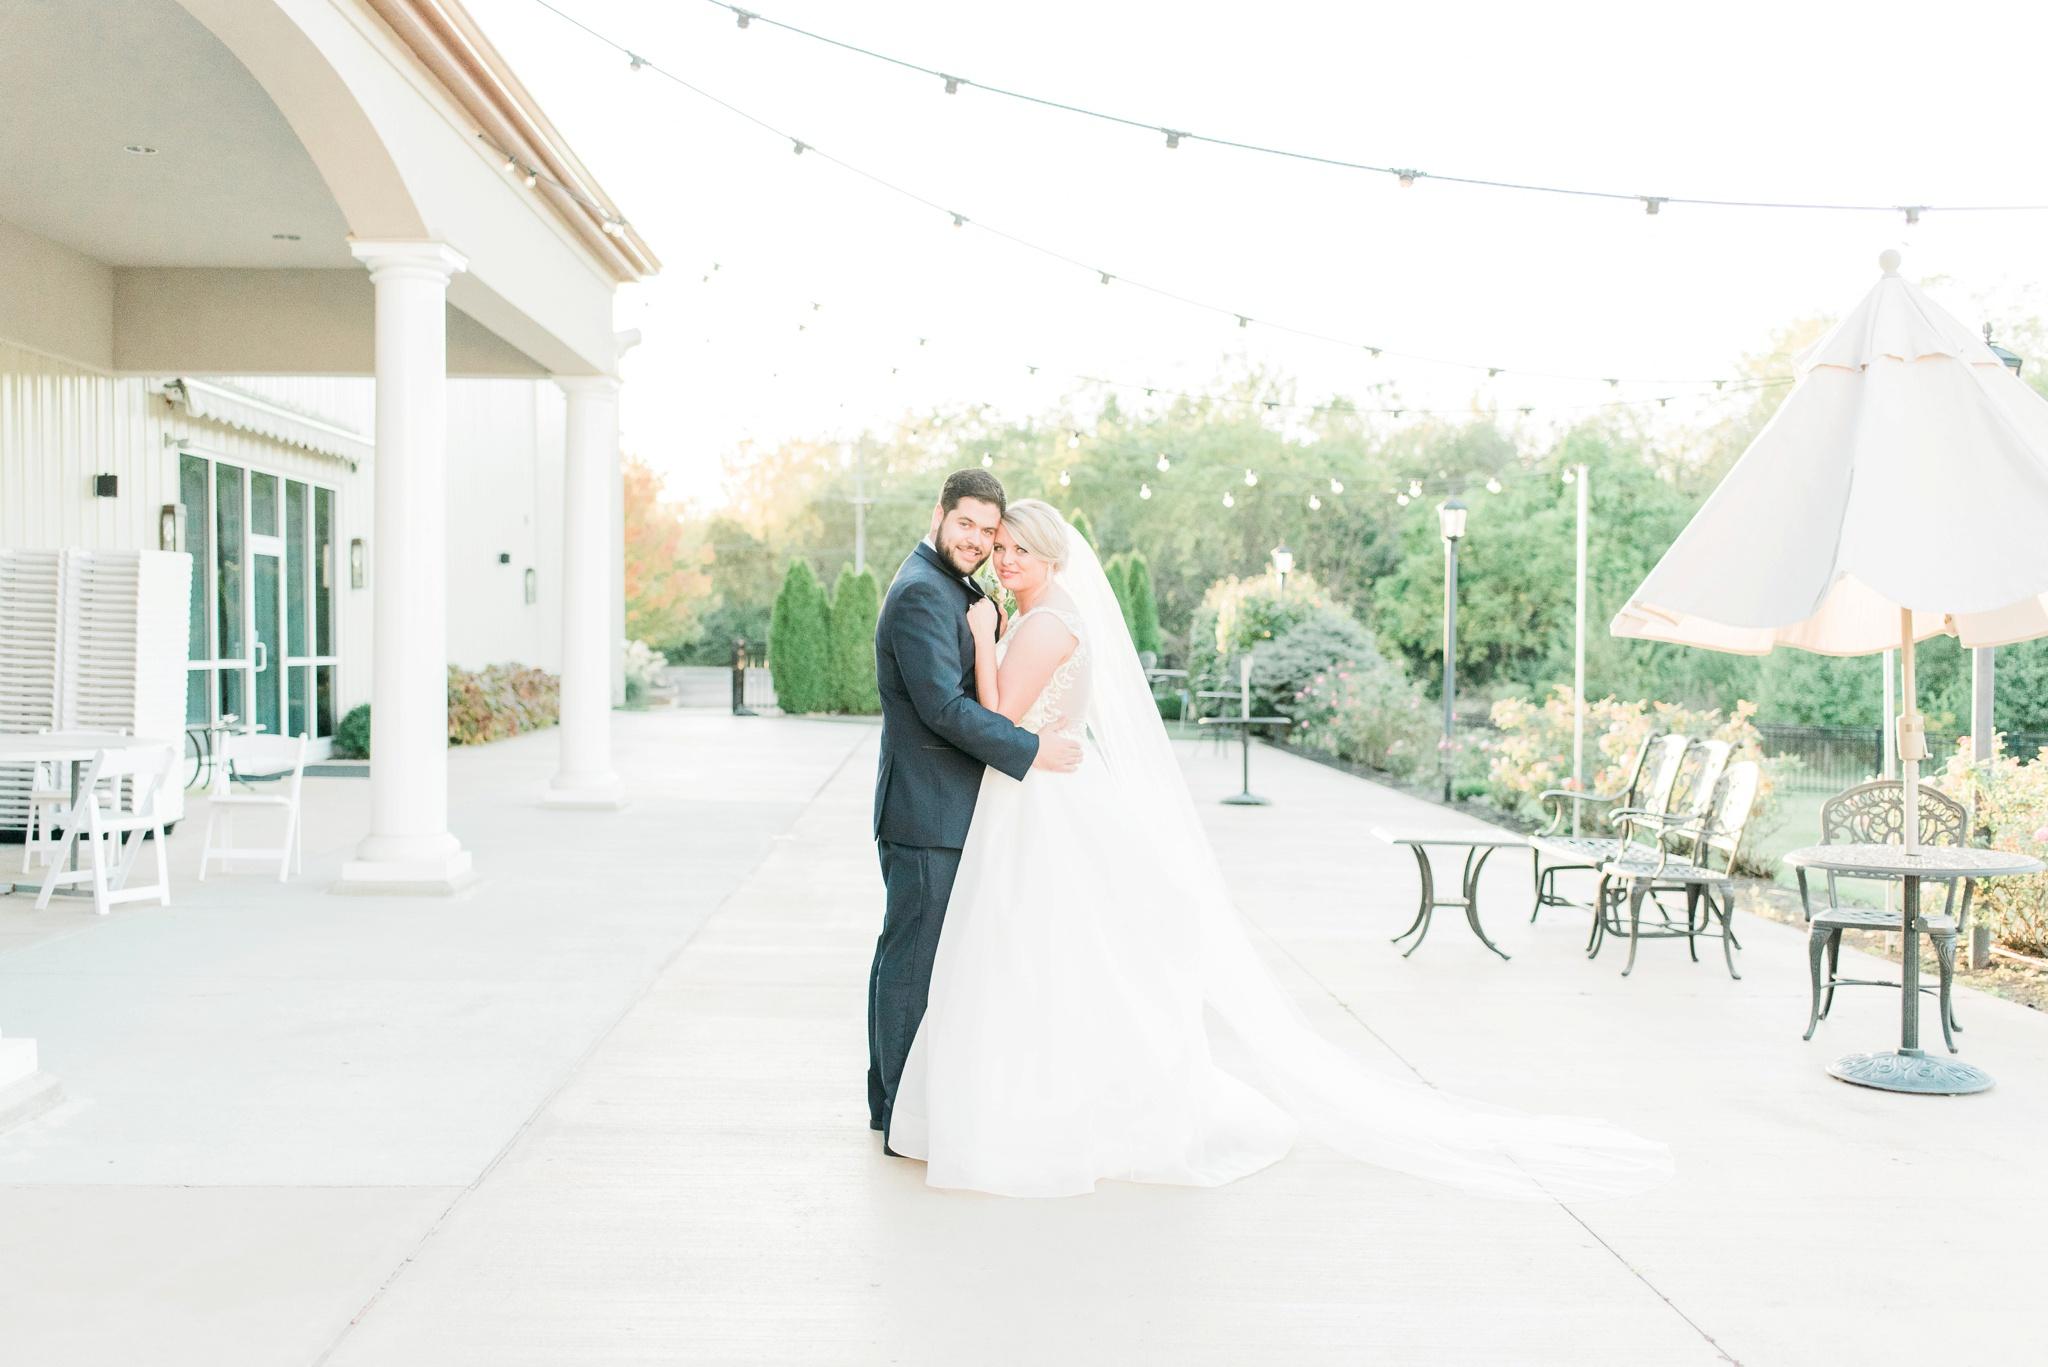 aladdin-shrine-center-wedding-grove-city-ohio-amber-jared_0136.jpg